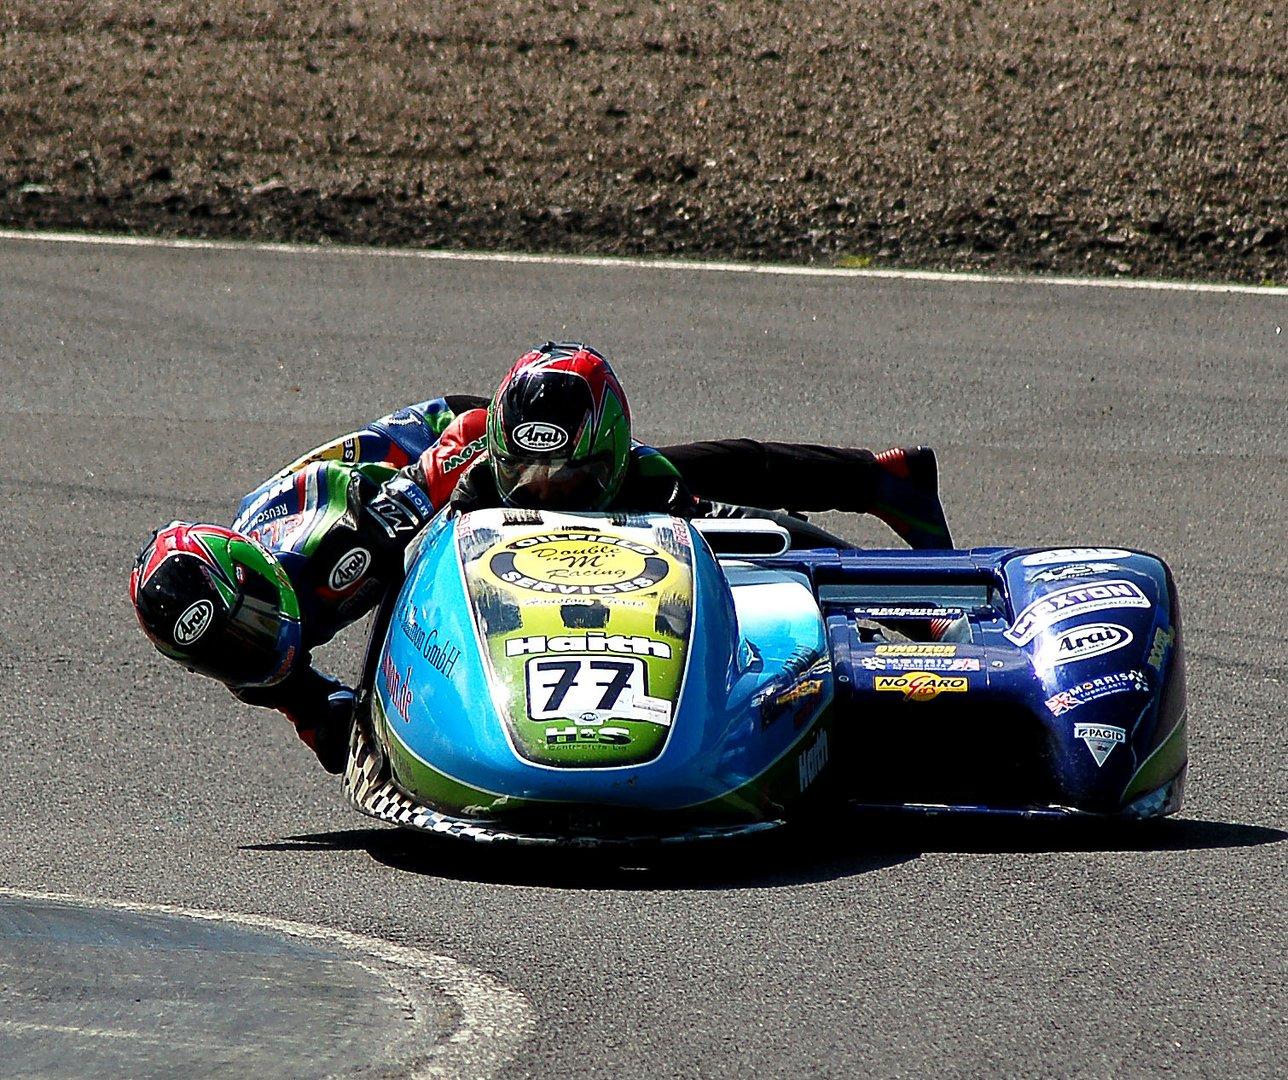 World Champion Sidecar Racer